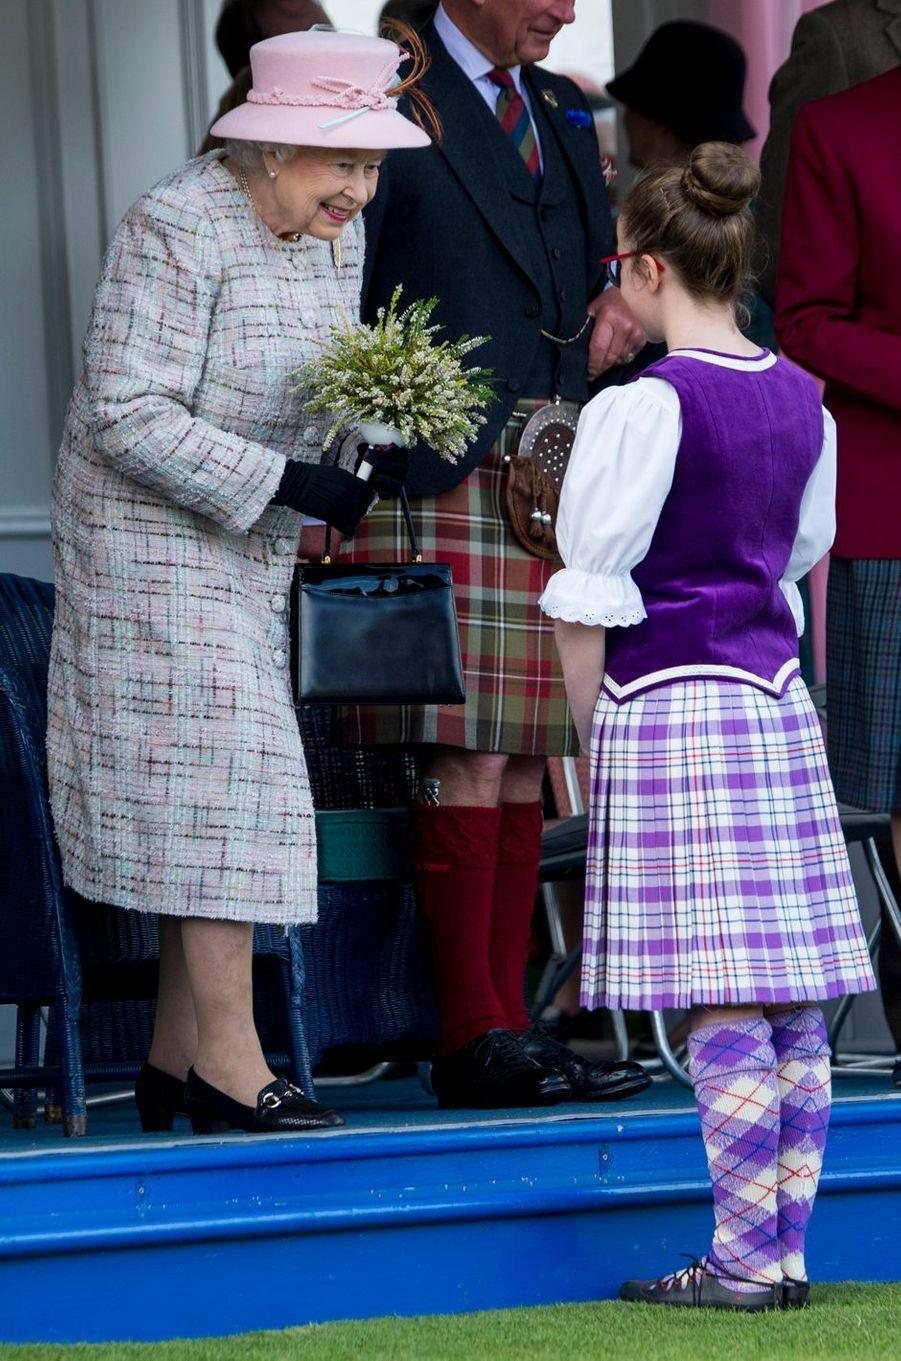 La reine Elizabeth II au Highlands Braemar Gathering en Ecosse, le 2 septembre 2017